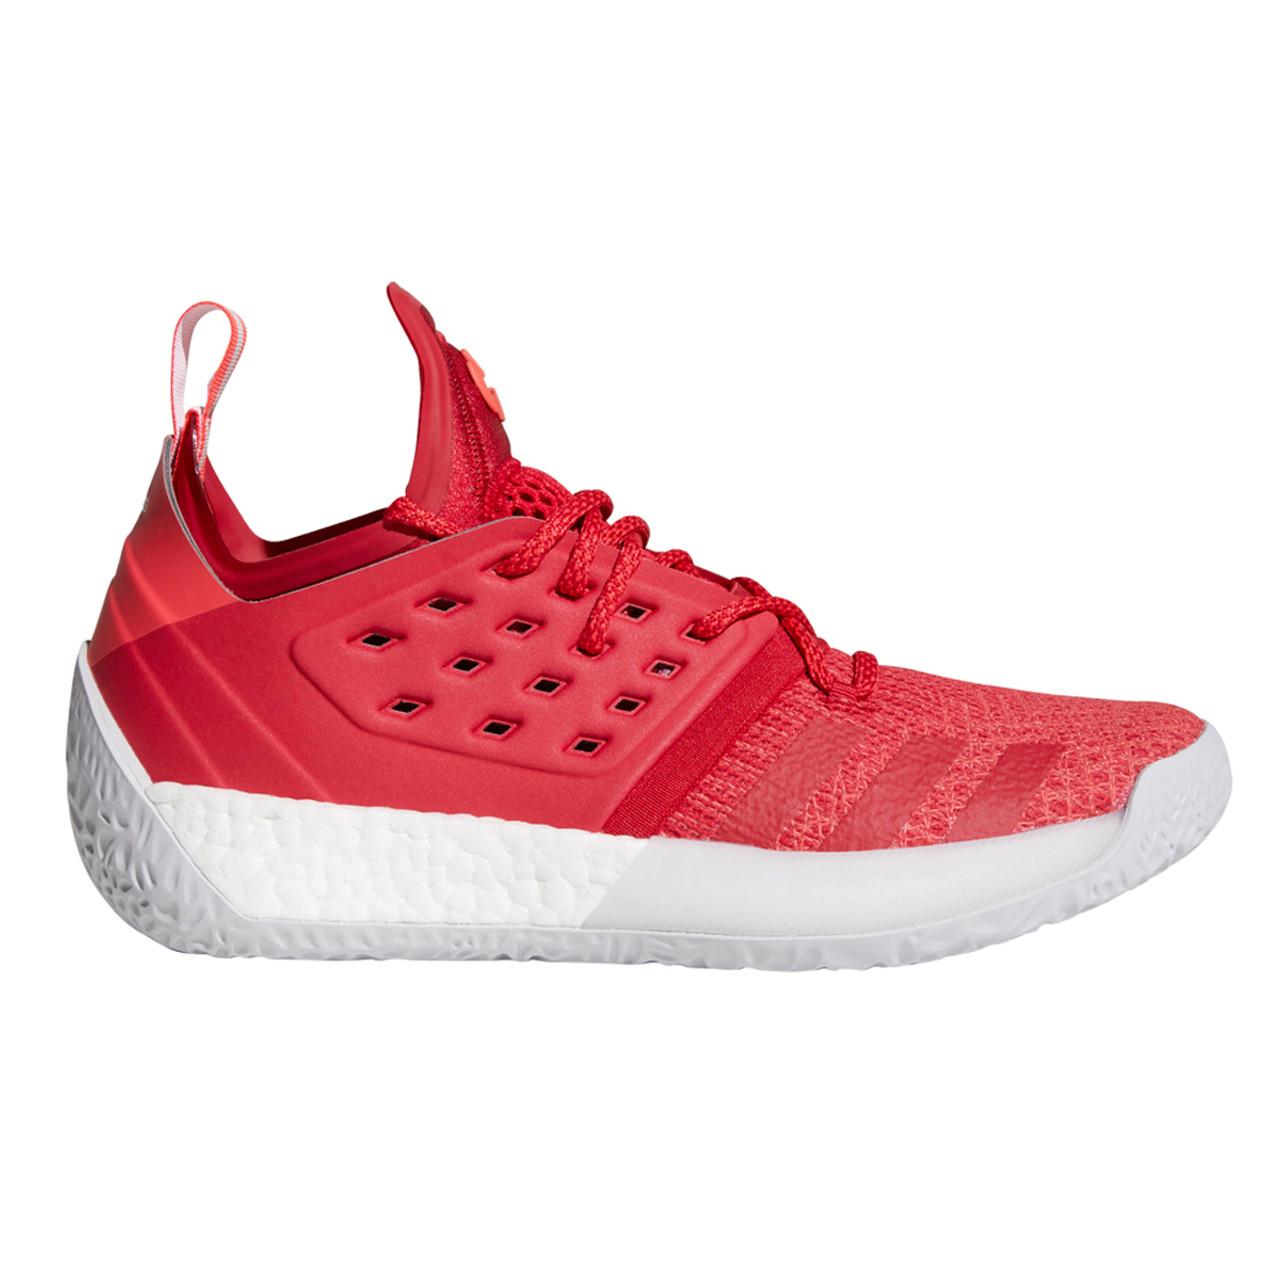 4ecac23605b9 Adidas Harden Vol. 2 Men s Basketball Sneakers BC1015 - Red